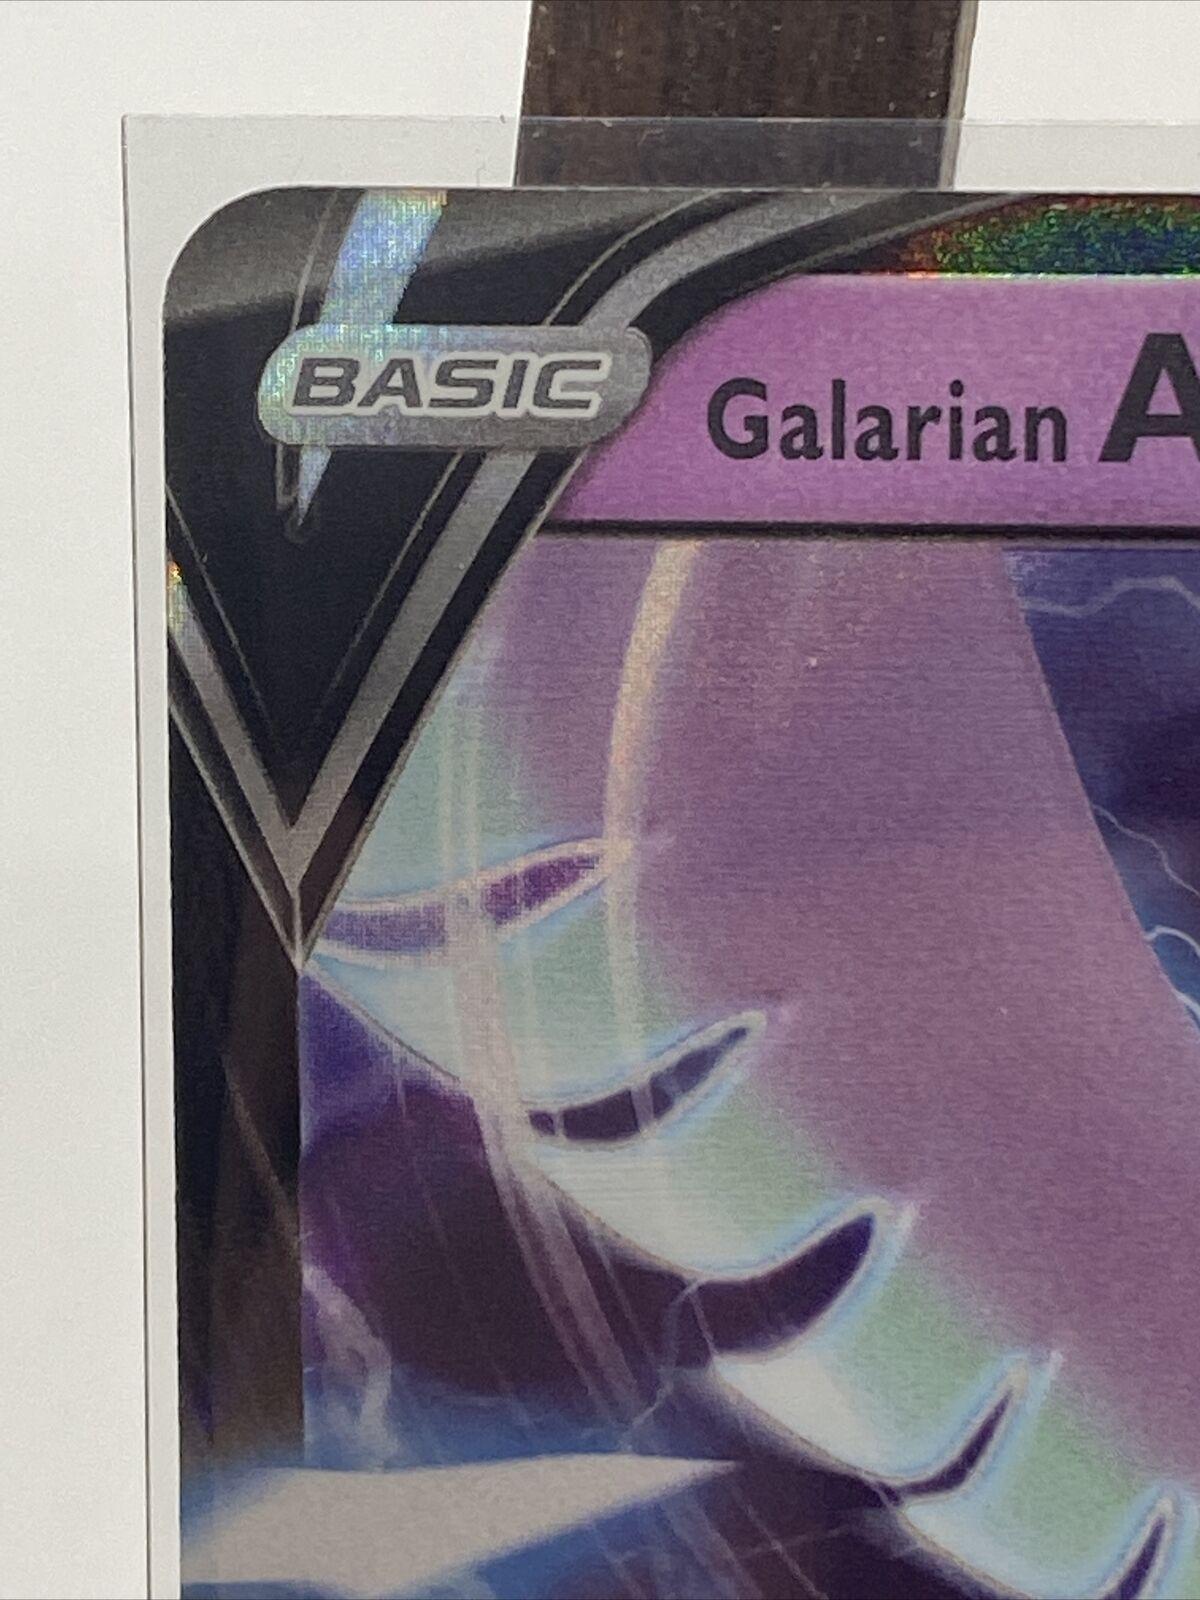 Pokemon Galarian Articuno V Card 058/198 Chilling Reign - Image 5